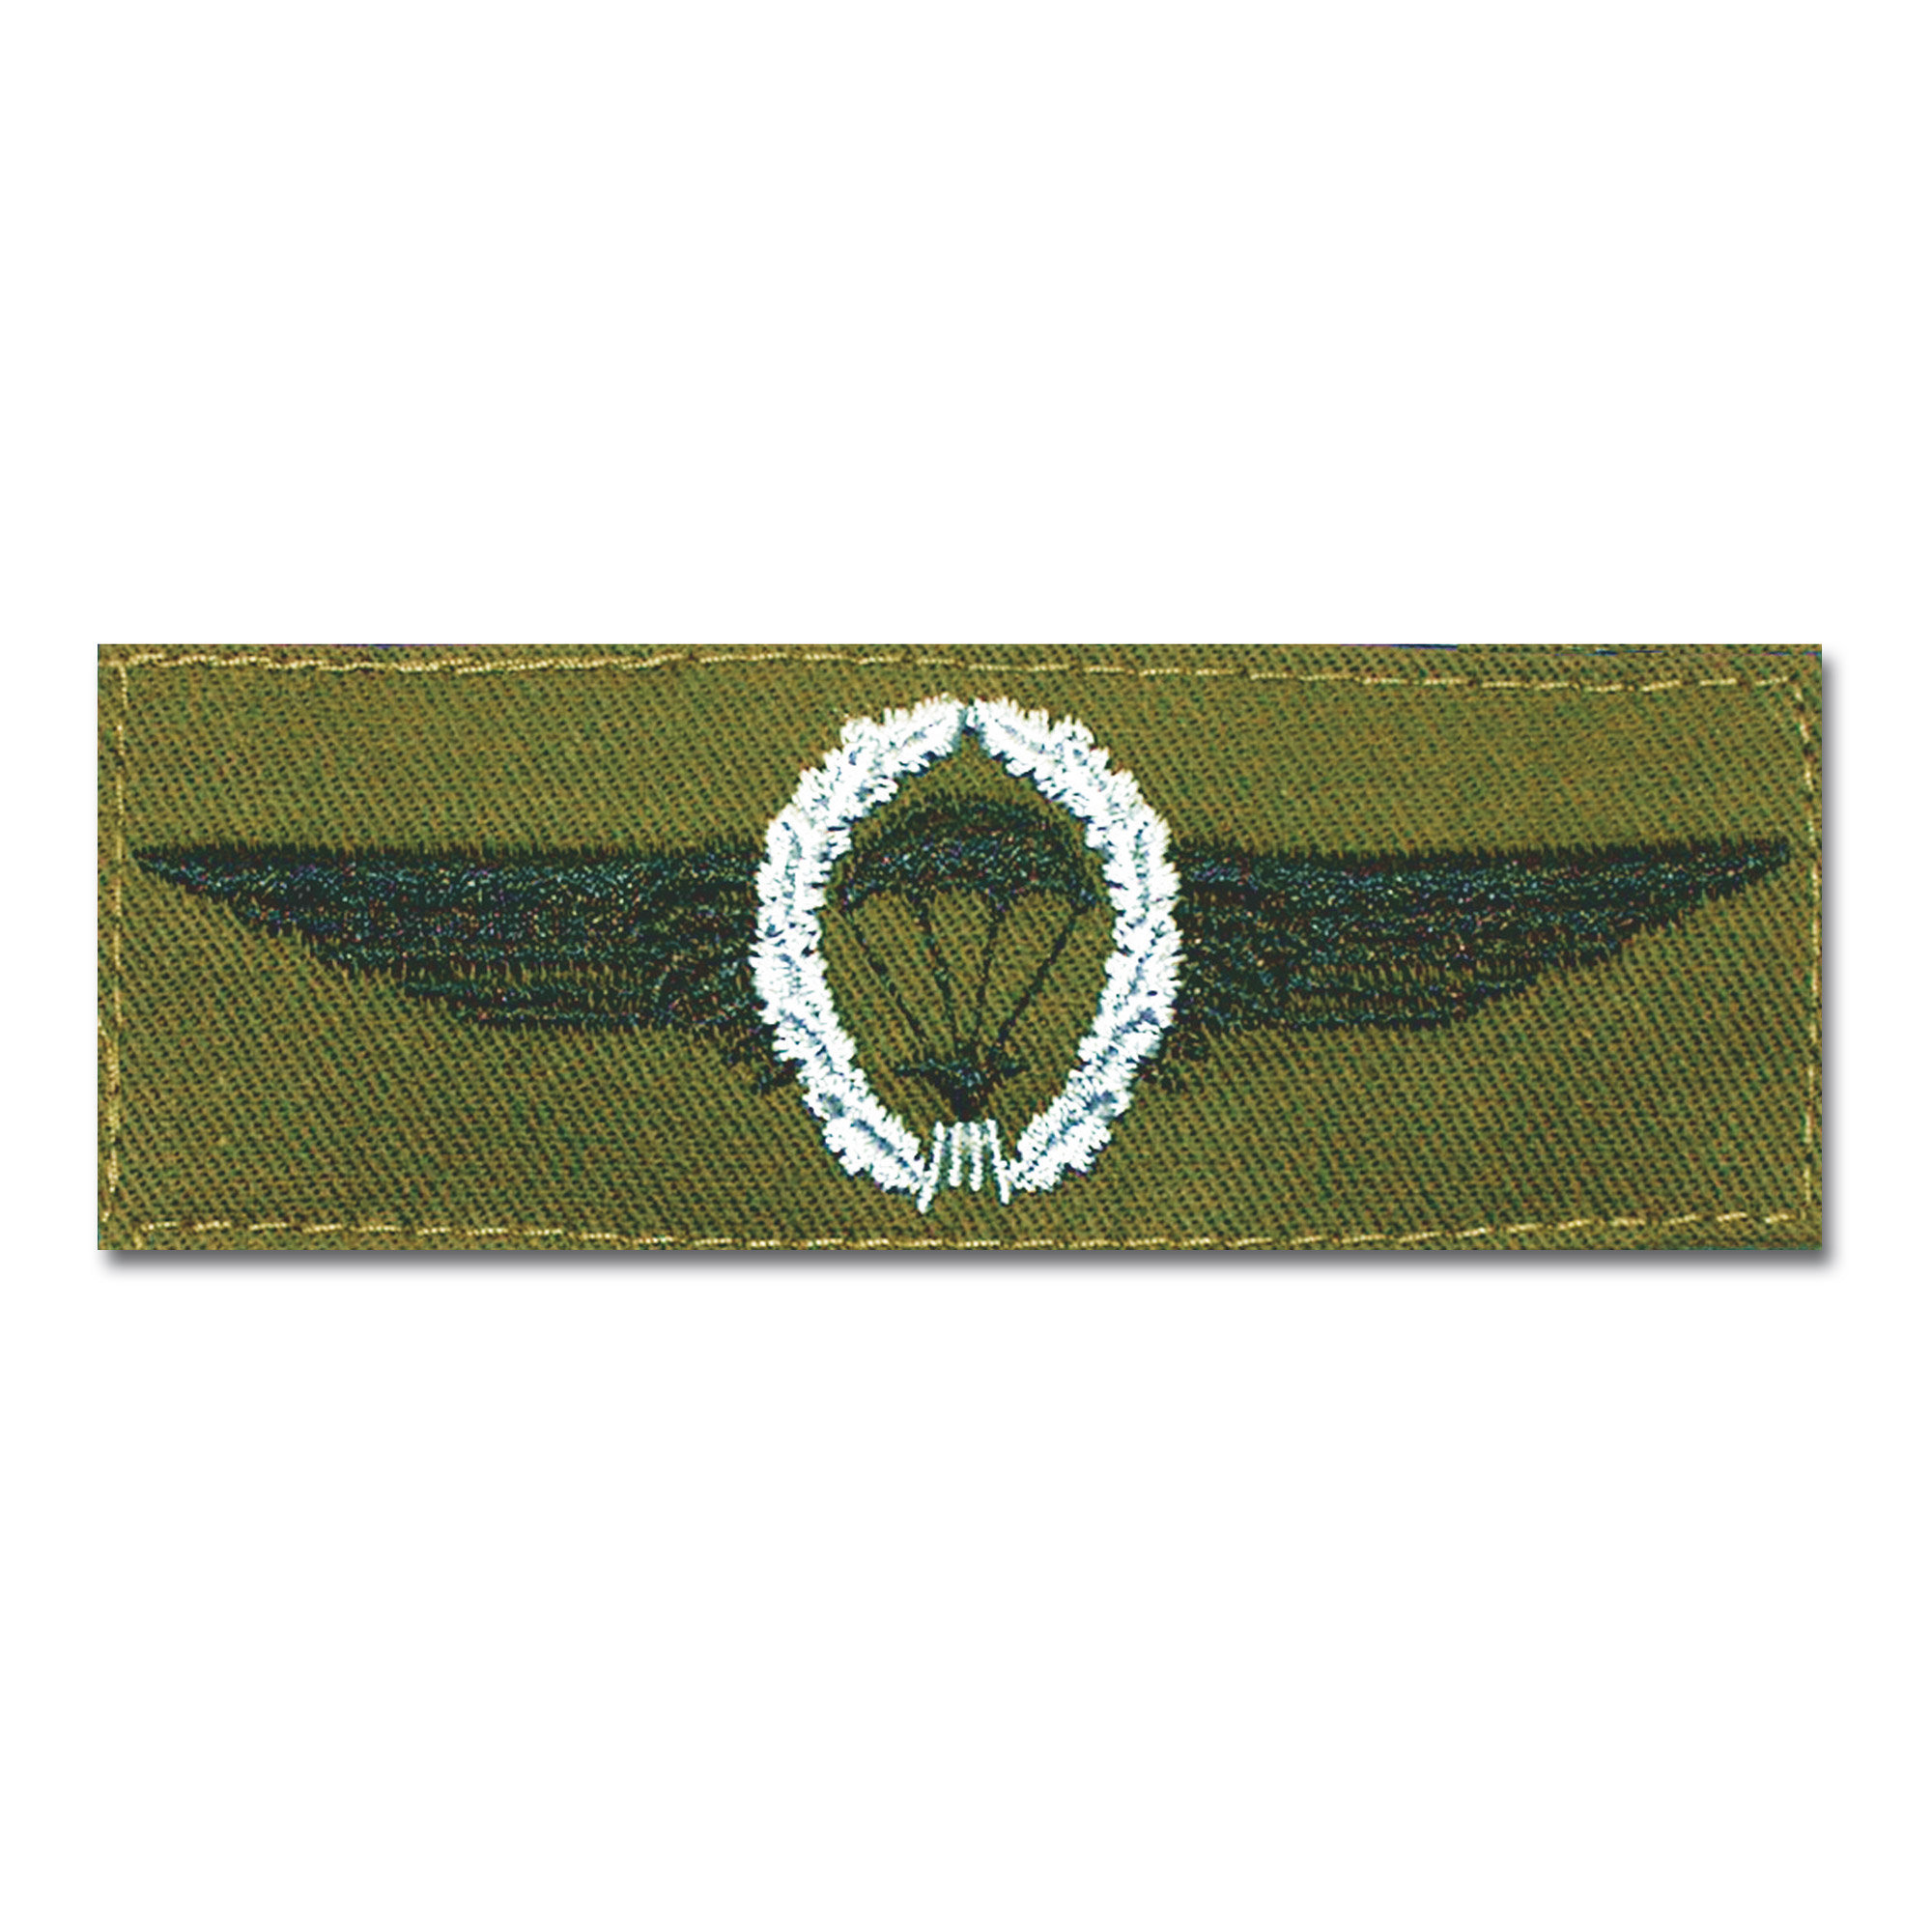 Insignia BW Fallschirmspringer plateado /verde oliva